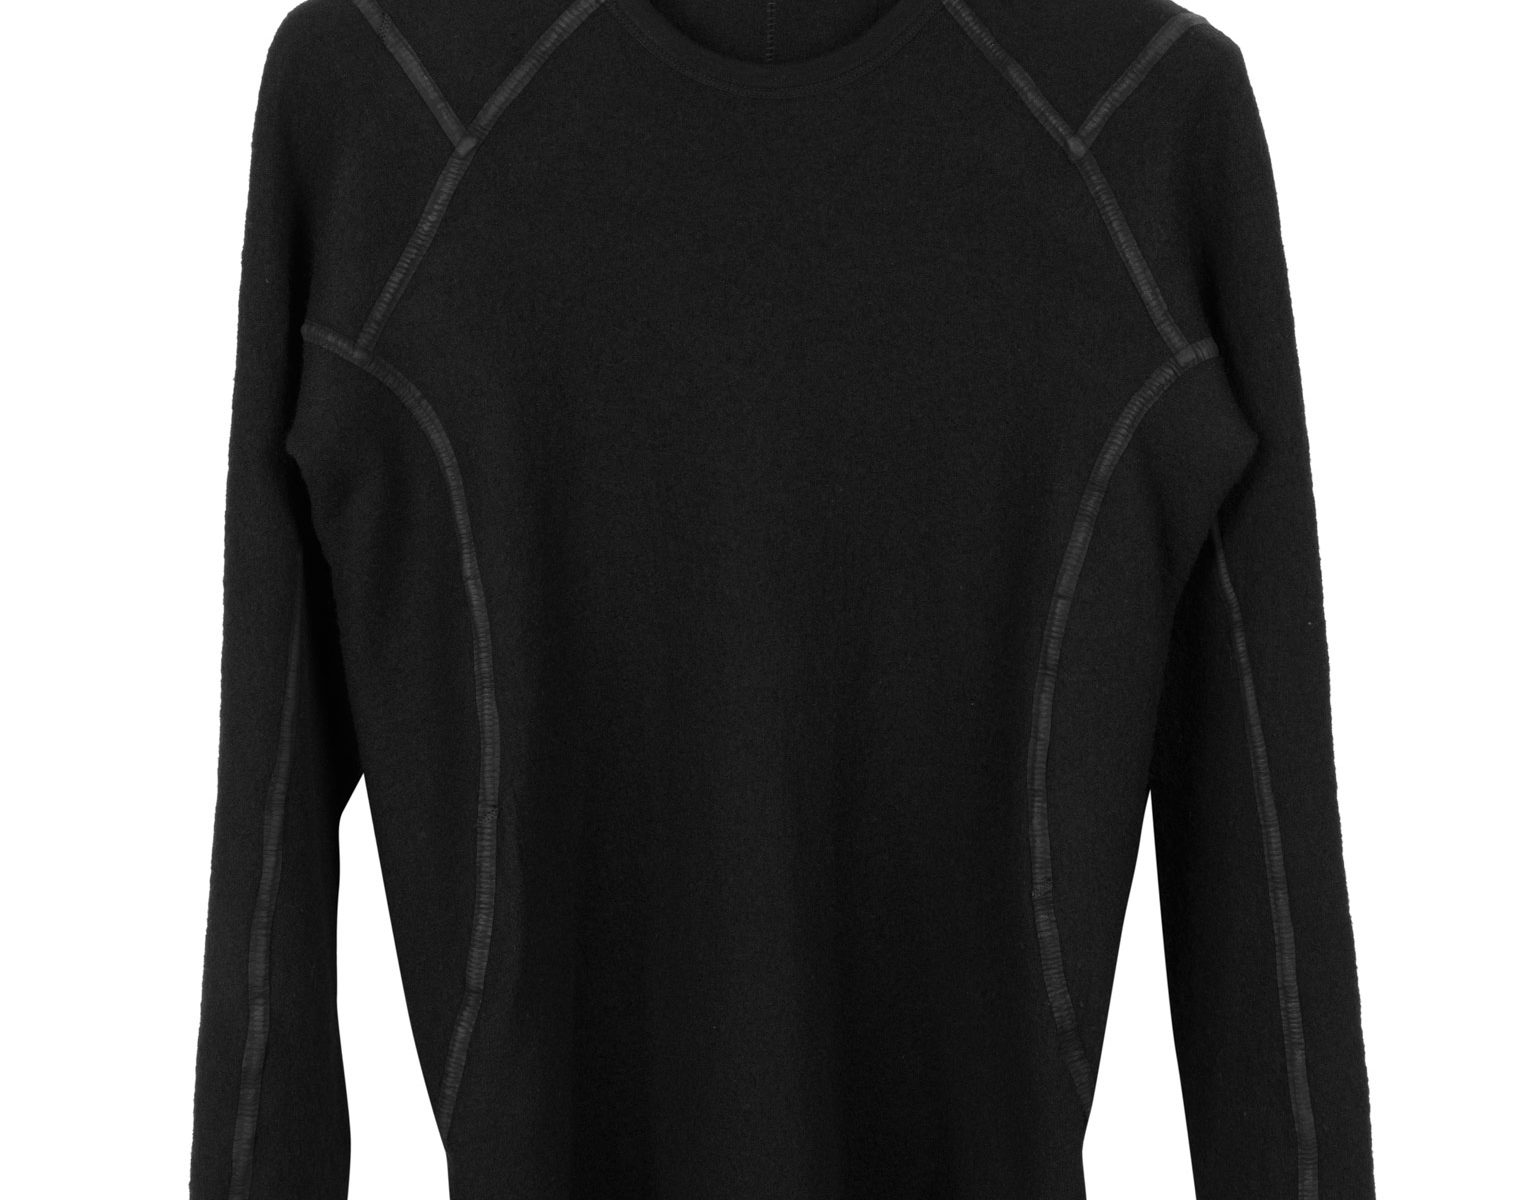 ISAAC SELLAM Wool Sweater 1